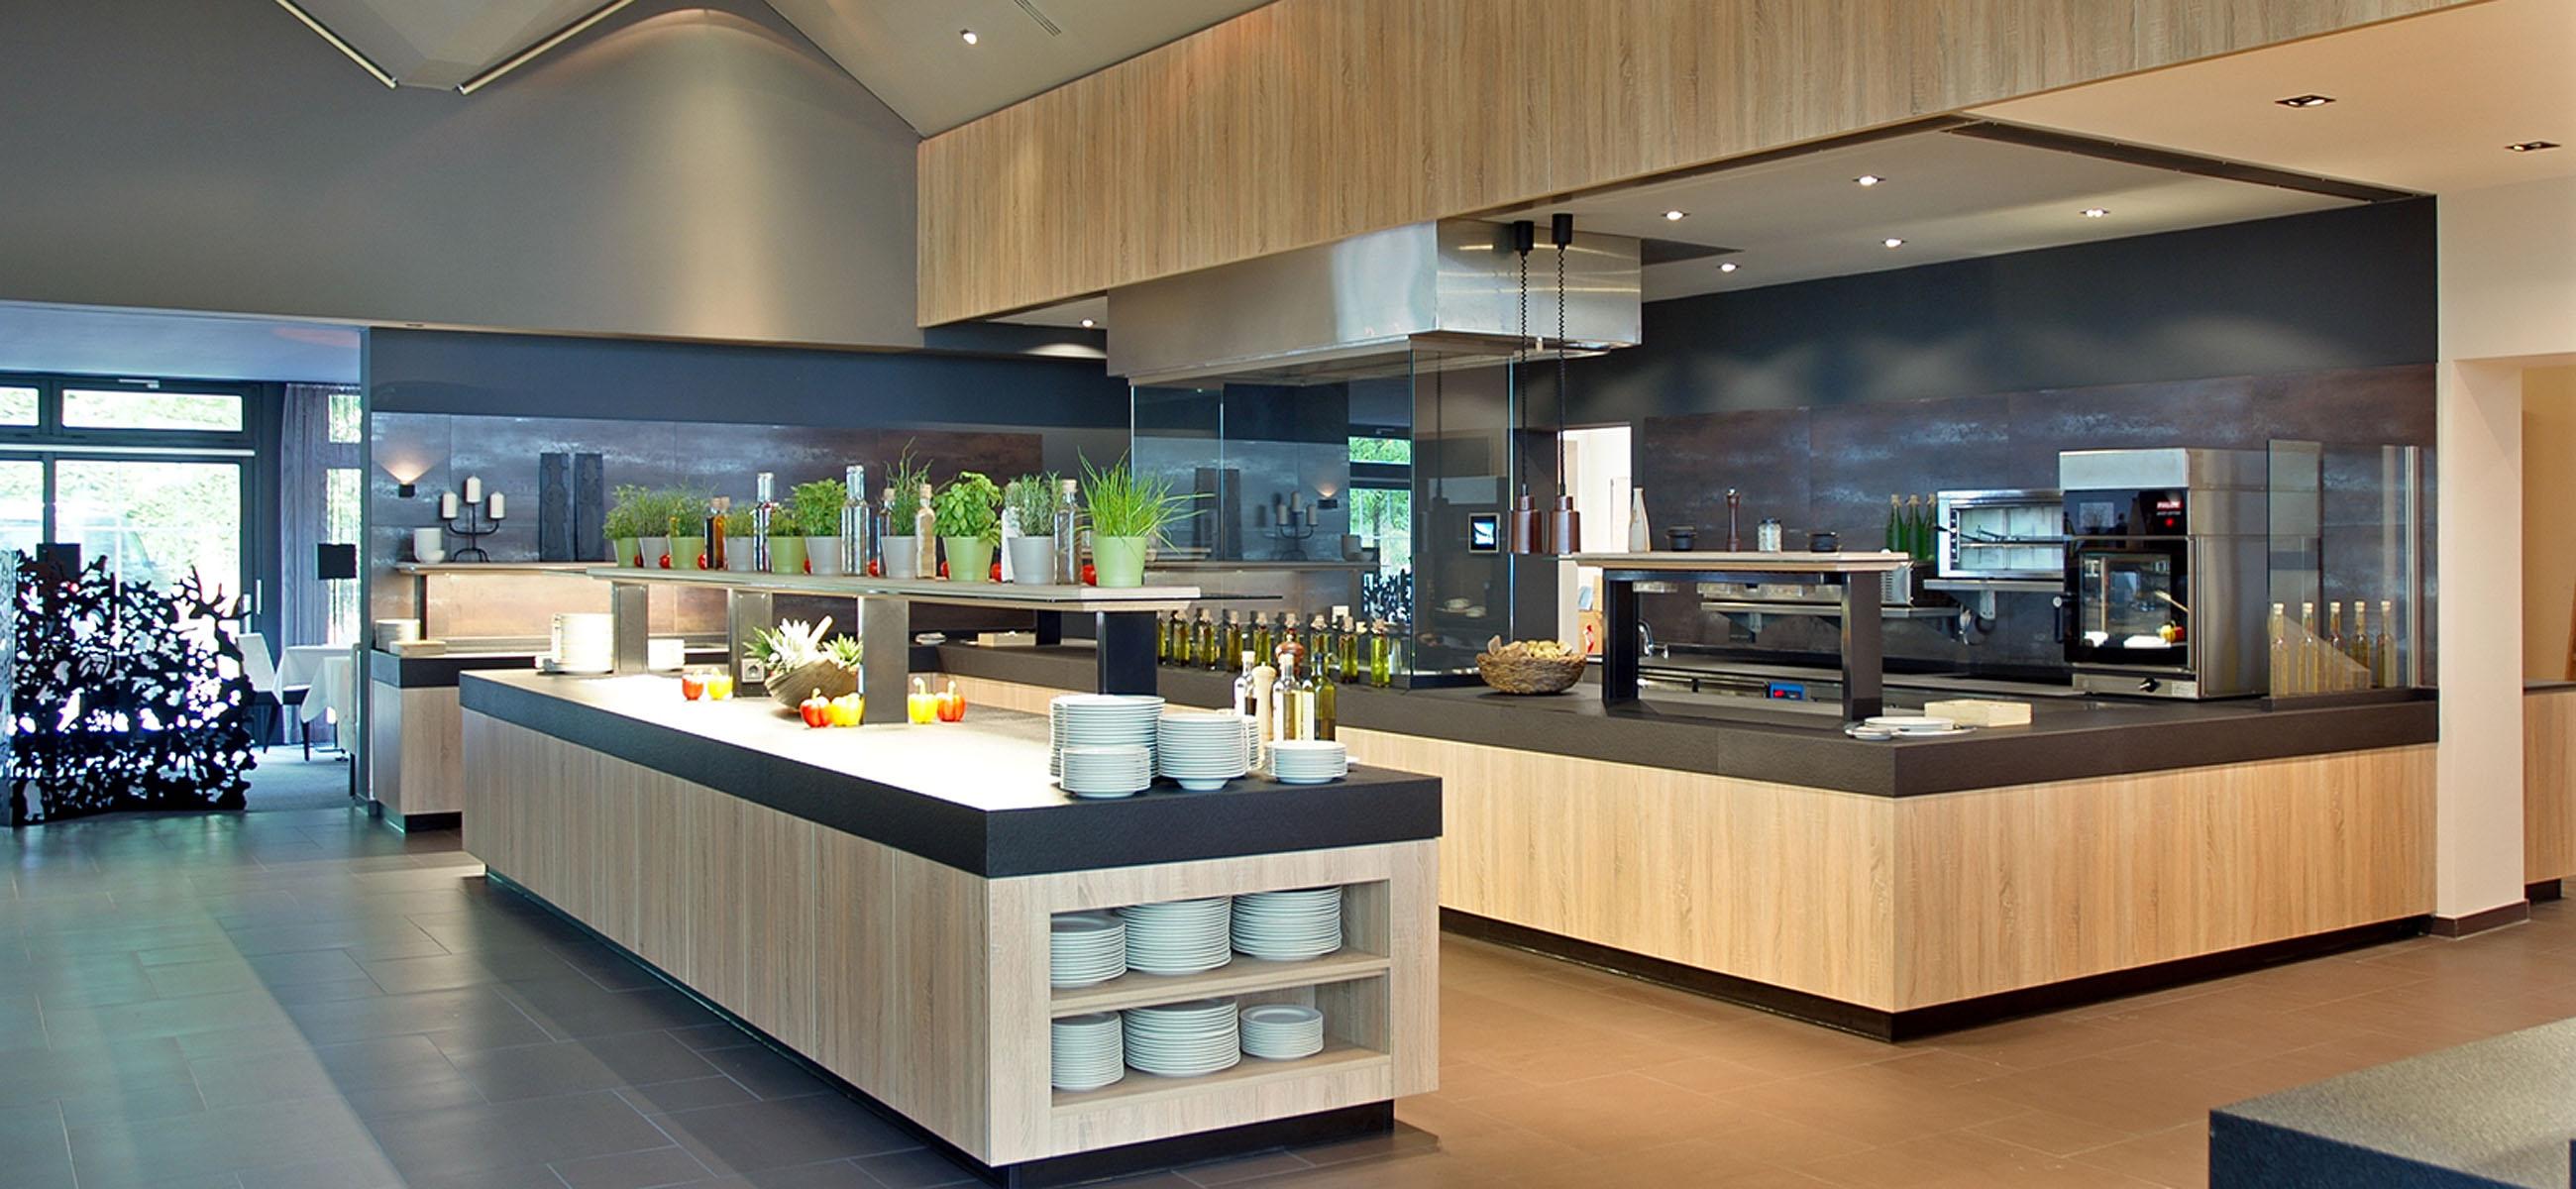 Hummert architekten bda restaurant z hotel zugbr cke for Gastro architektur